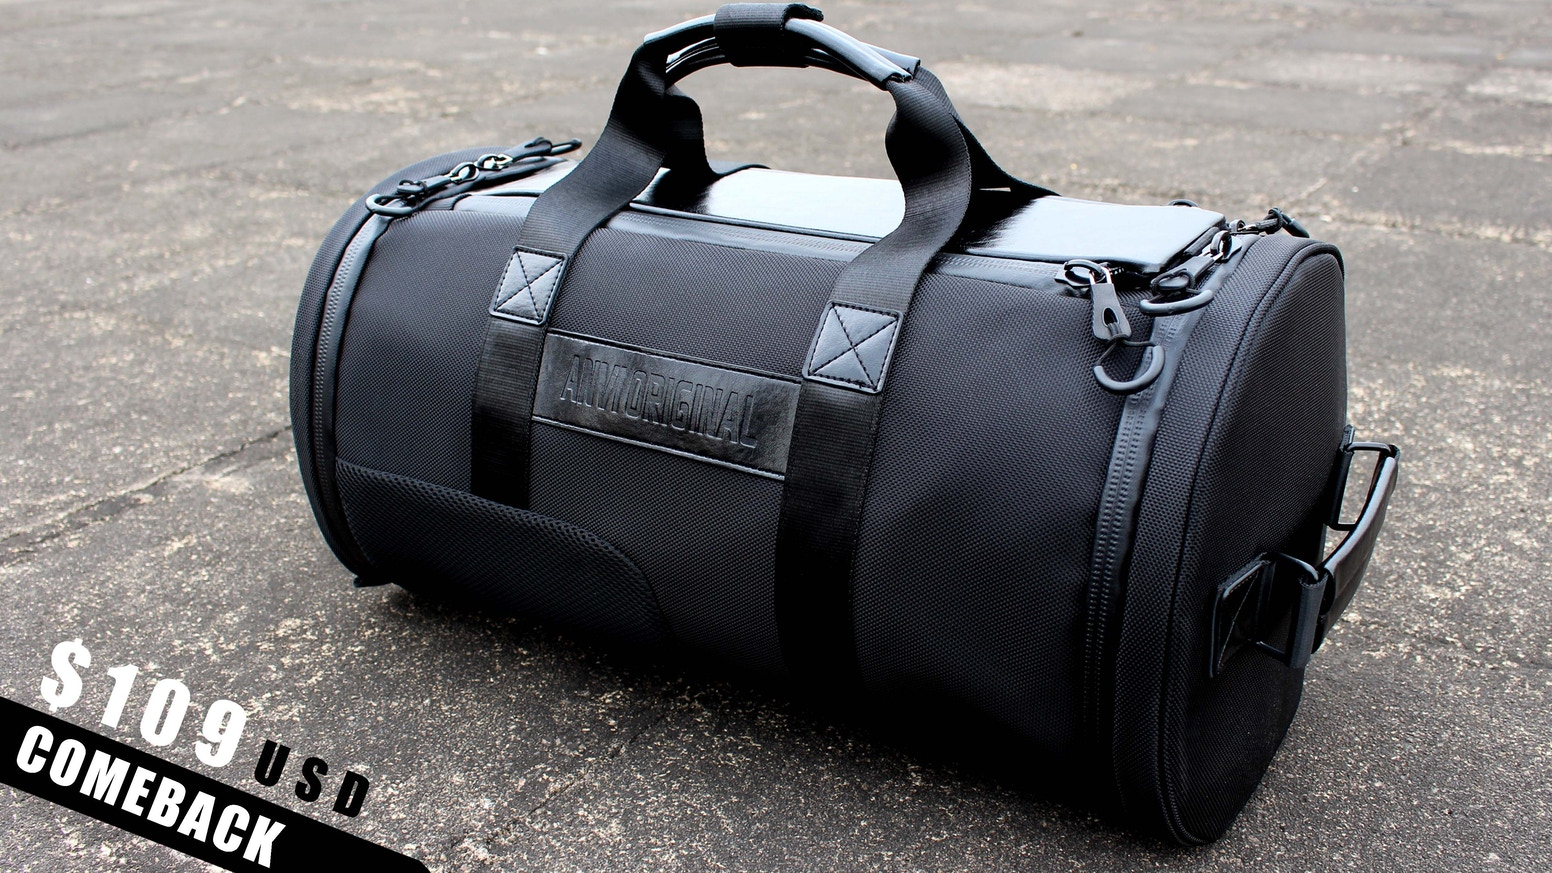 83f180a4802 Breether2.0 comeback  Minimal gym travel duffle   duffel bag by Anvi ...